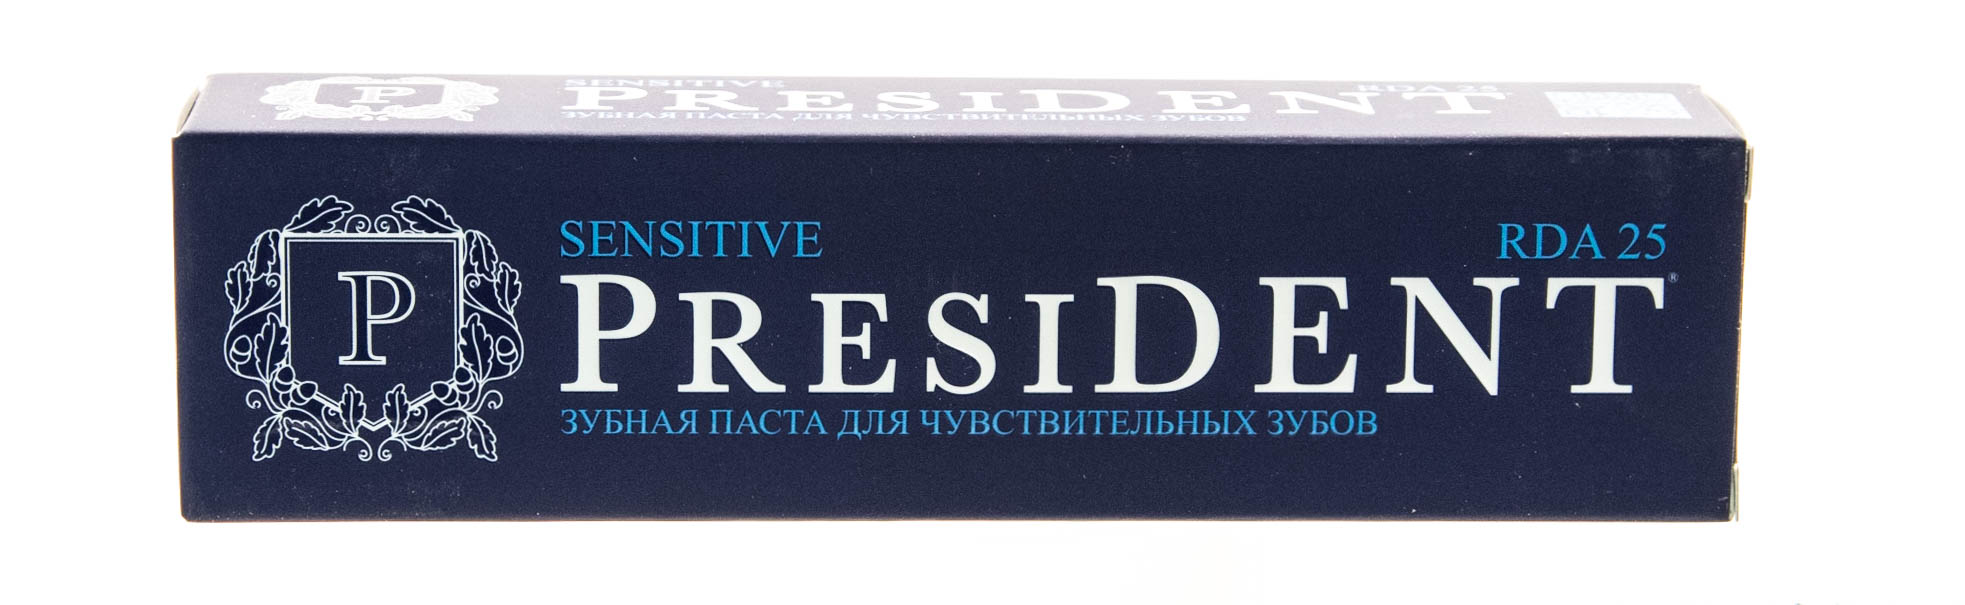 Купить President Сенситив паста зубная 50 мл (President, Sensitive), Италия